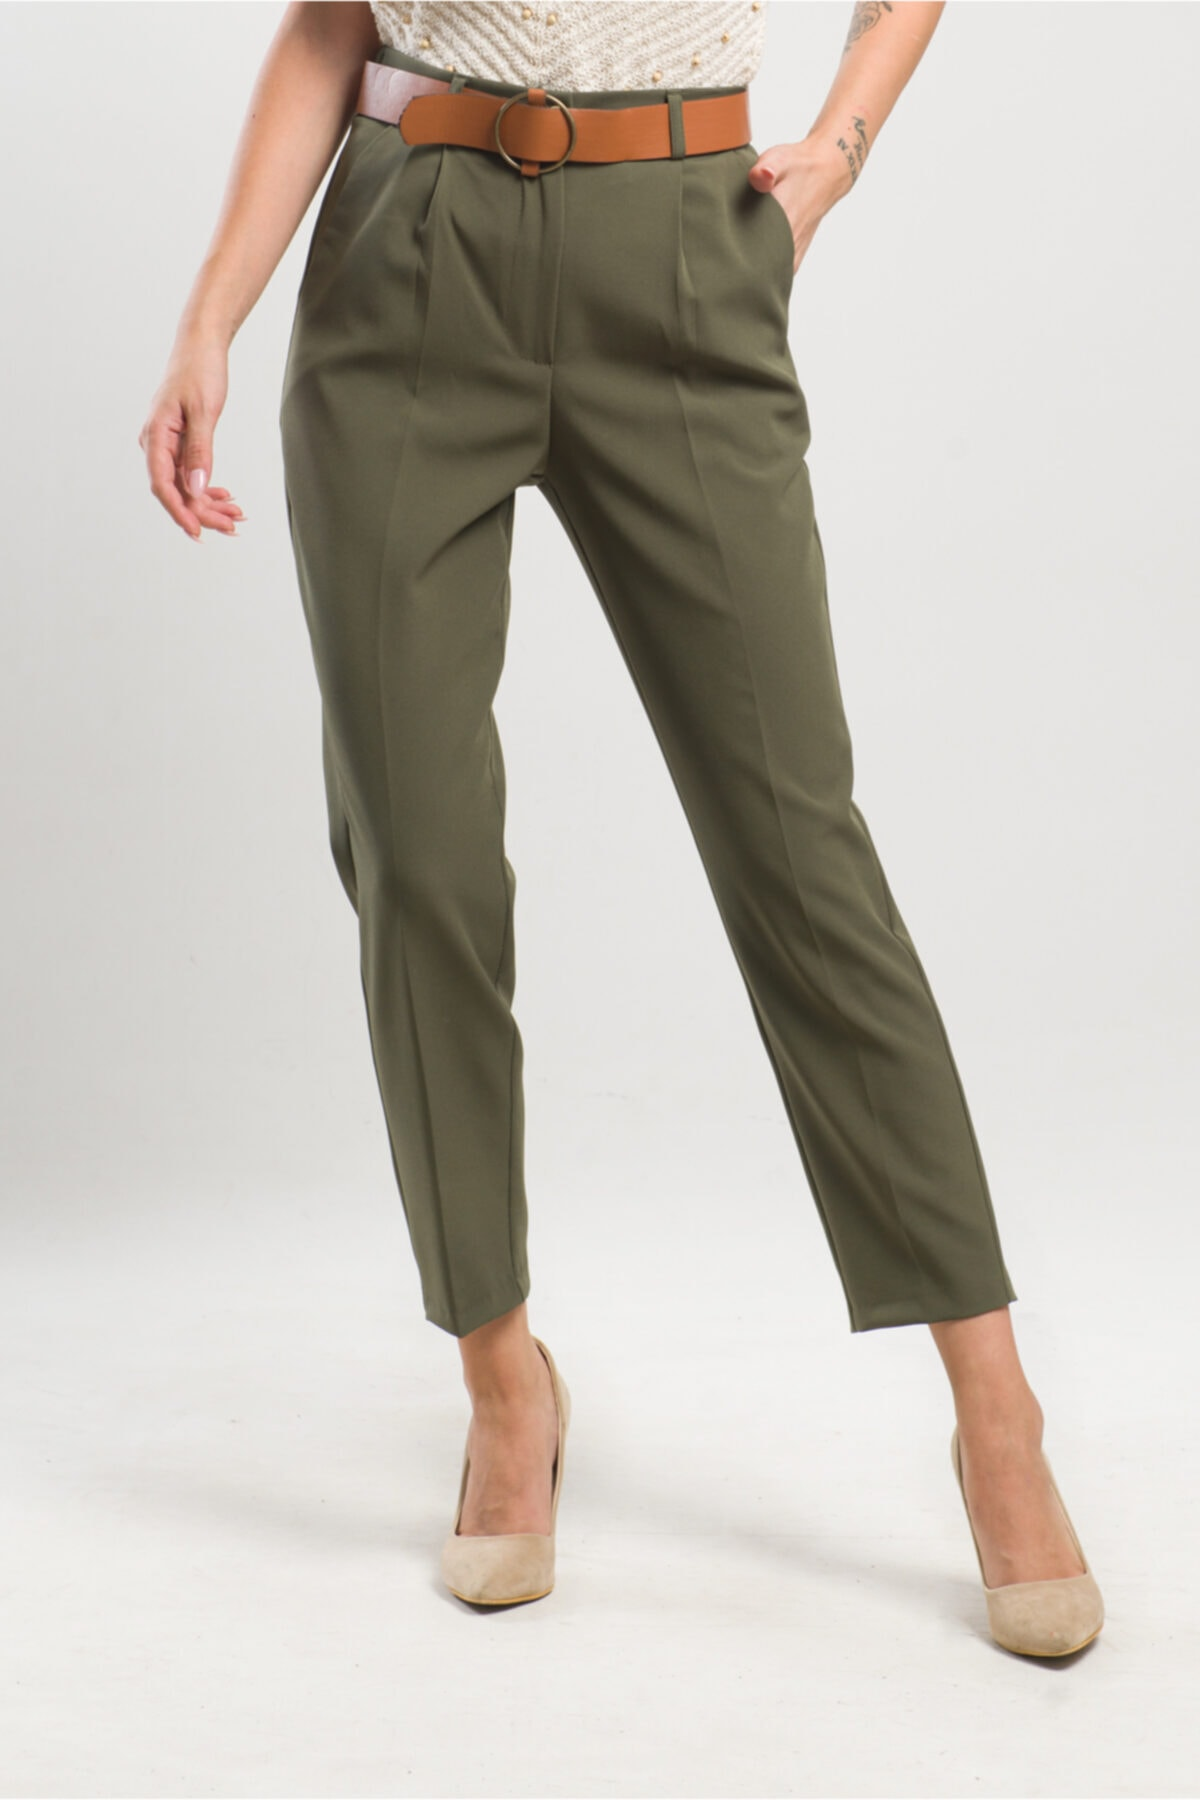 caddecity Kemerli Double Casual Pantolon 2